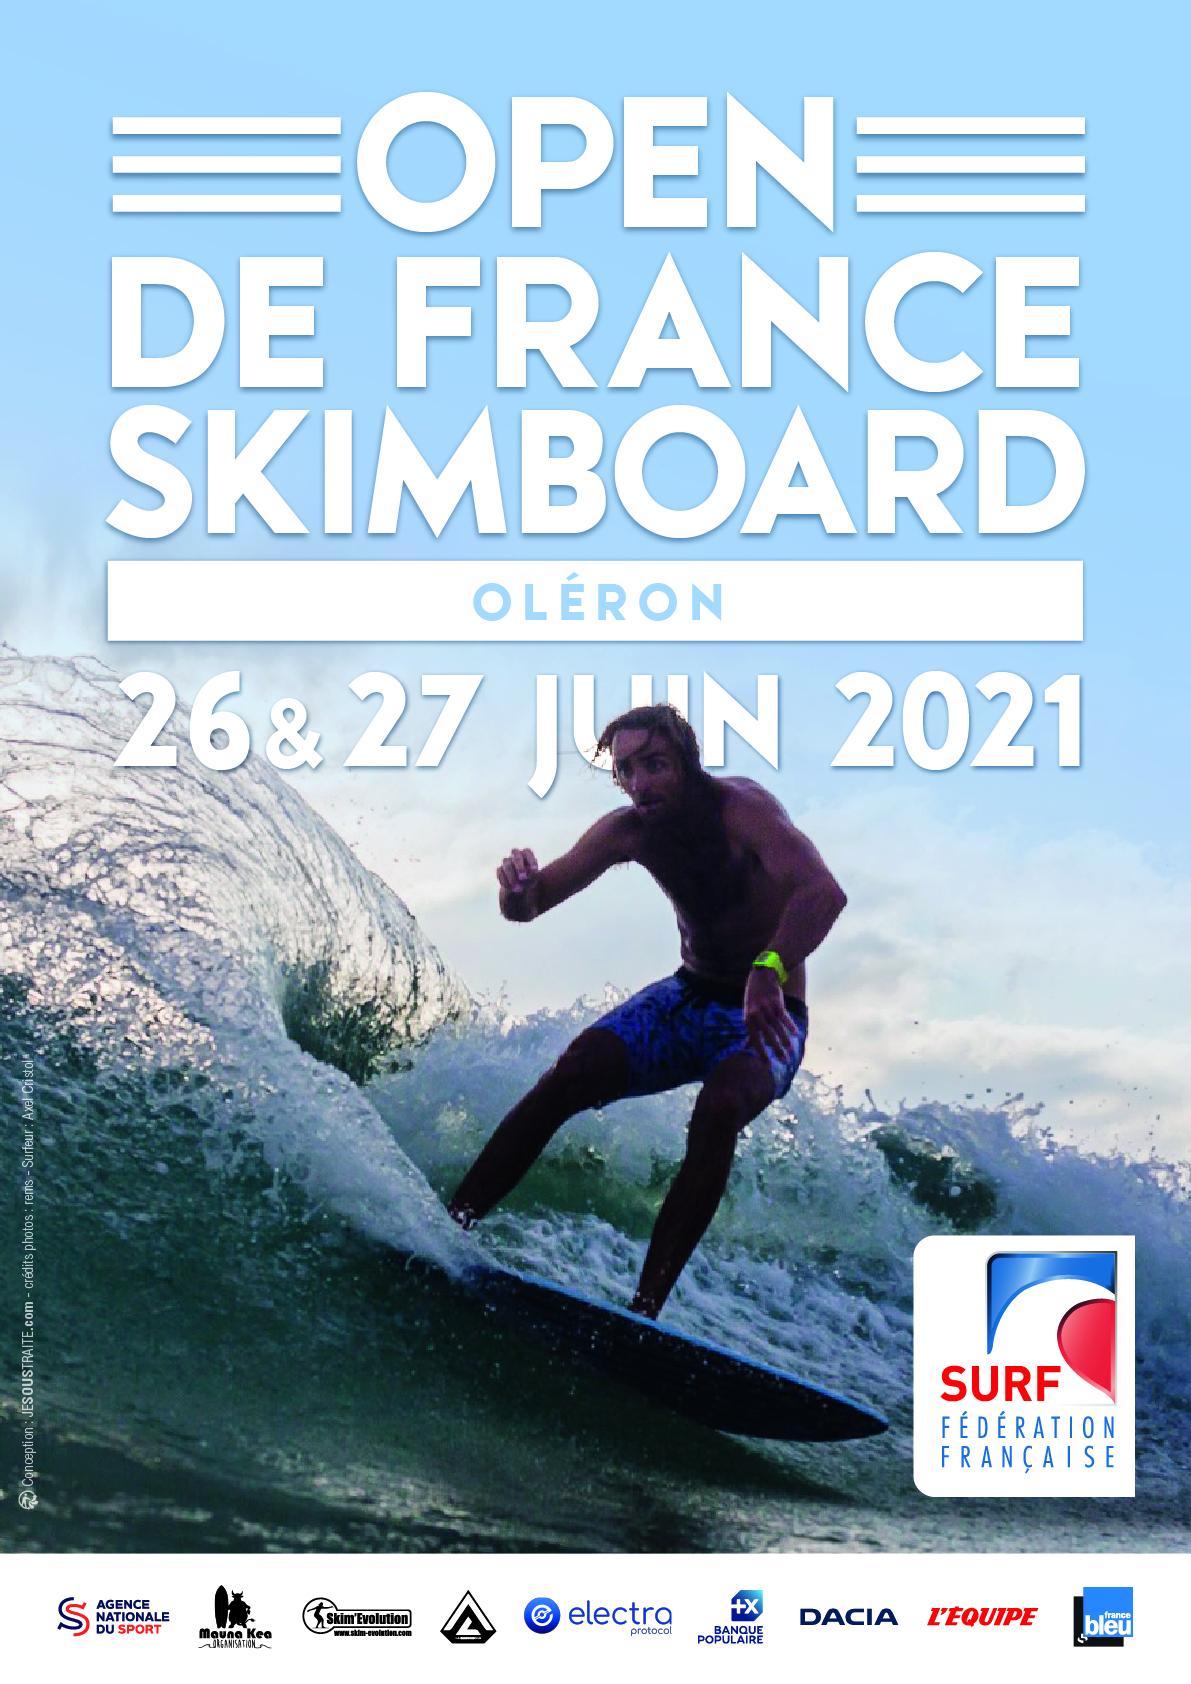 Affiche-open-france-Skimboard2021-Oleron